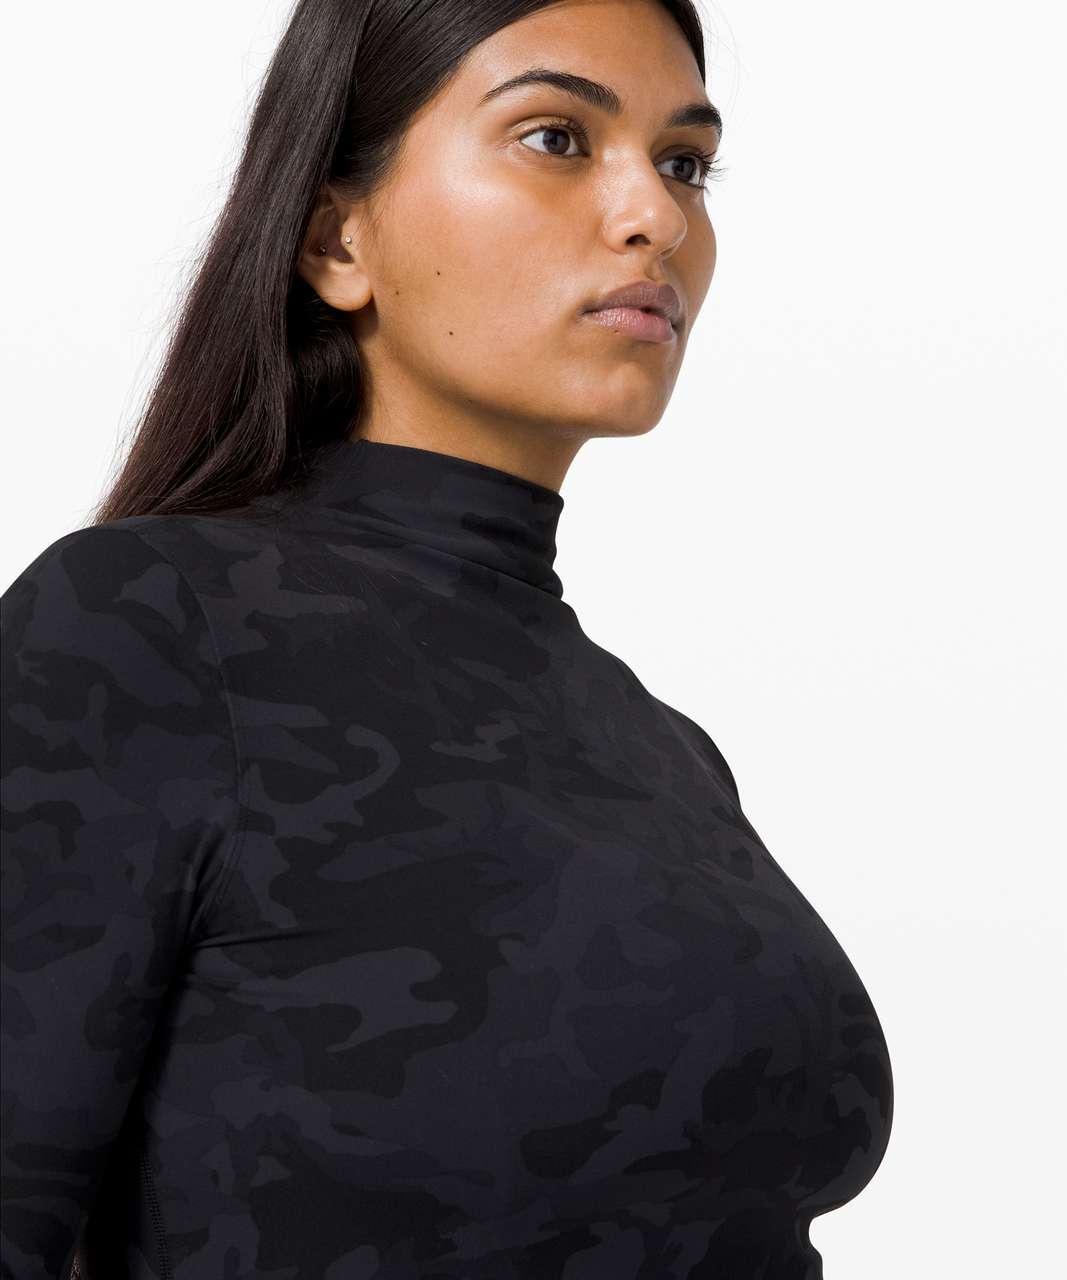 Lululemon All Aligned Mock Neck Long Sleeve - Incognito Camo Multi Grey